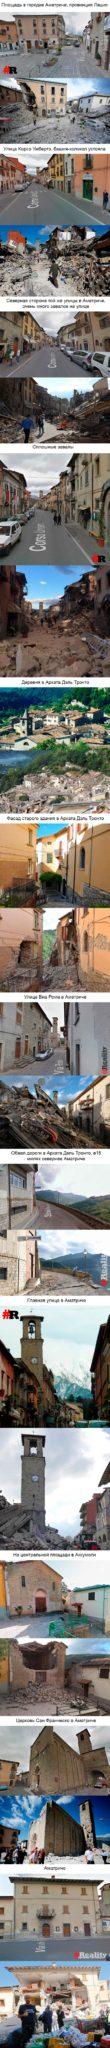 До после землетрясения в Италии